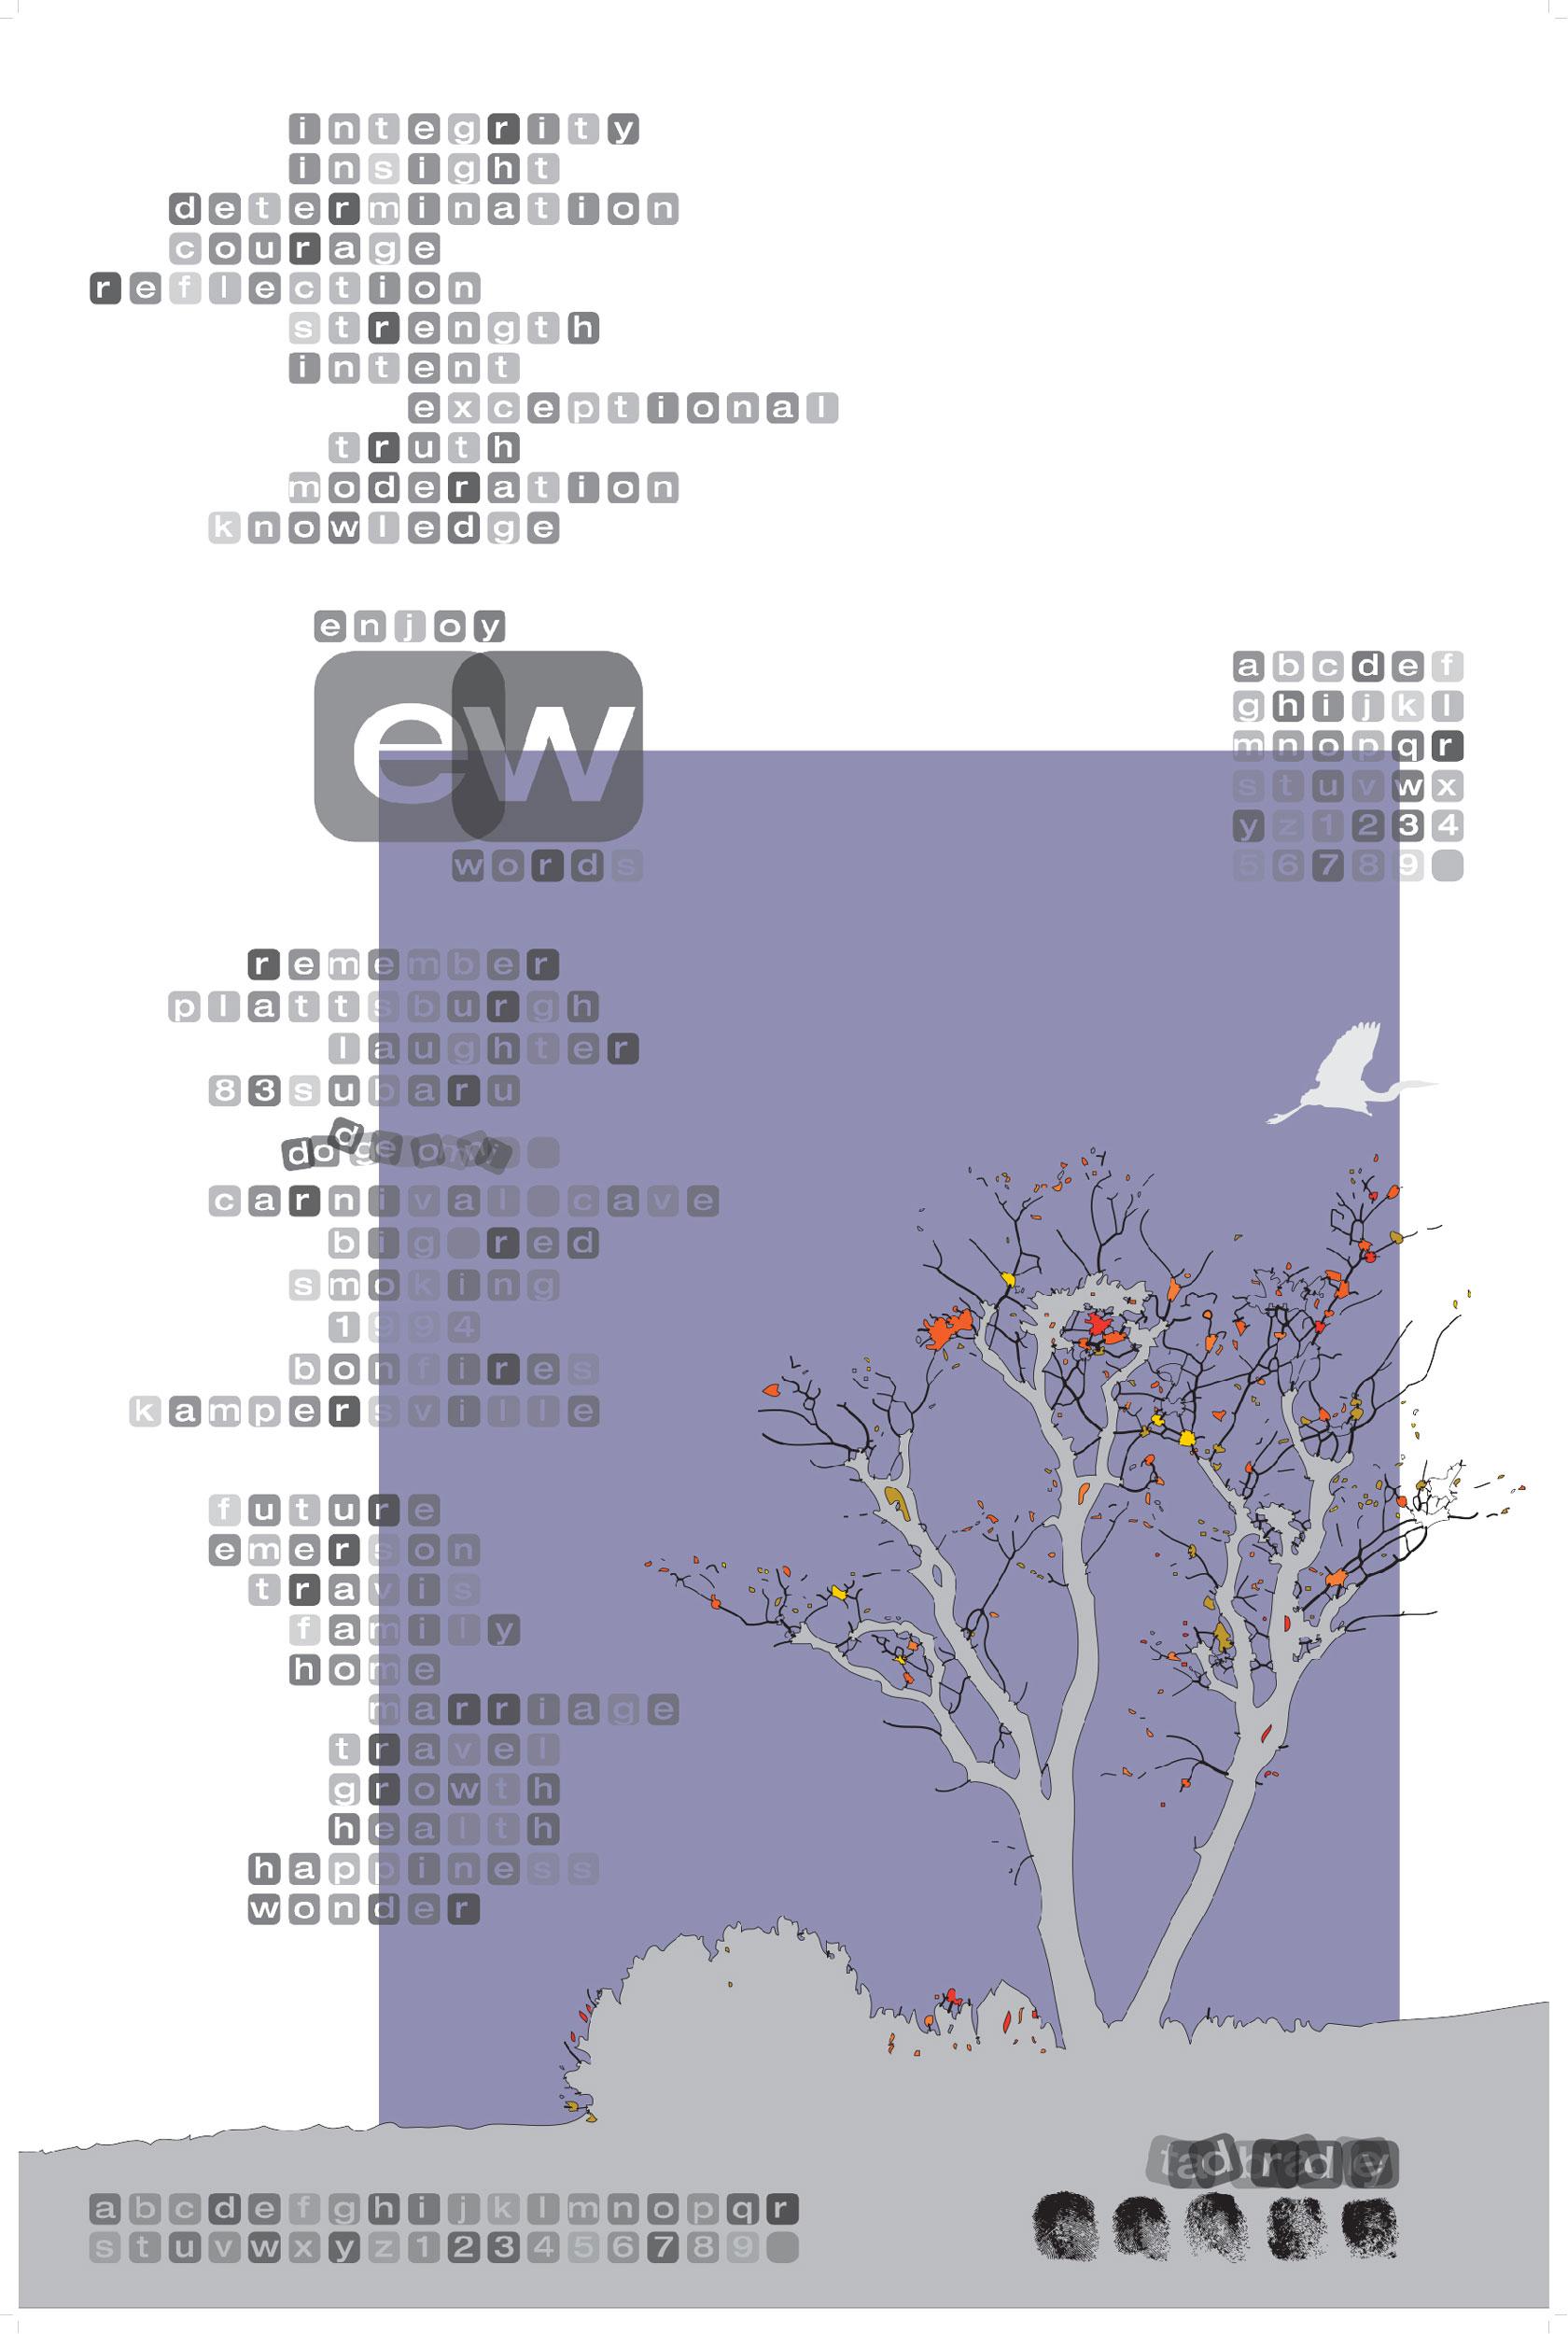 graphic-design-07.jpg